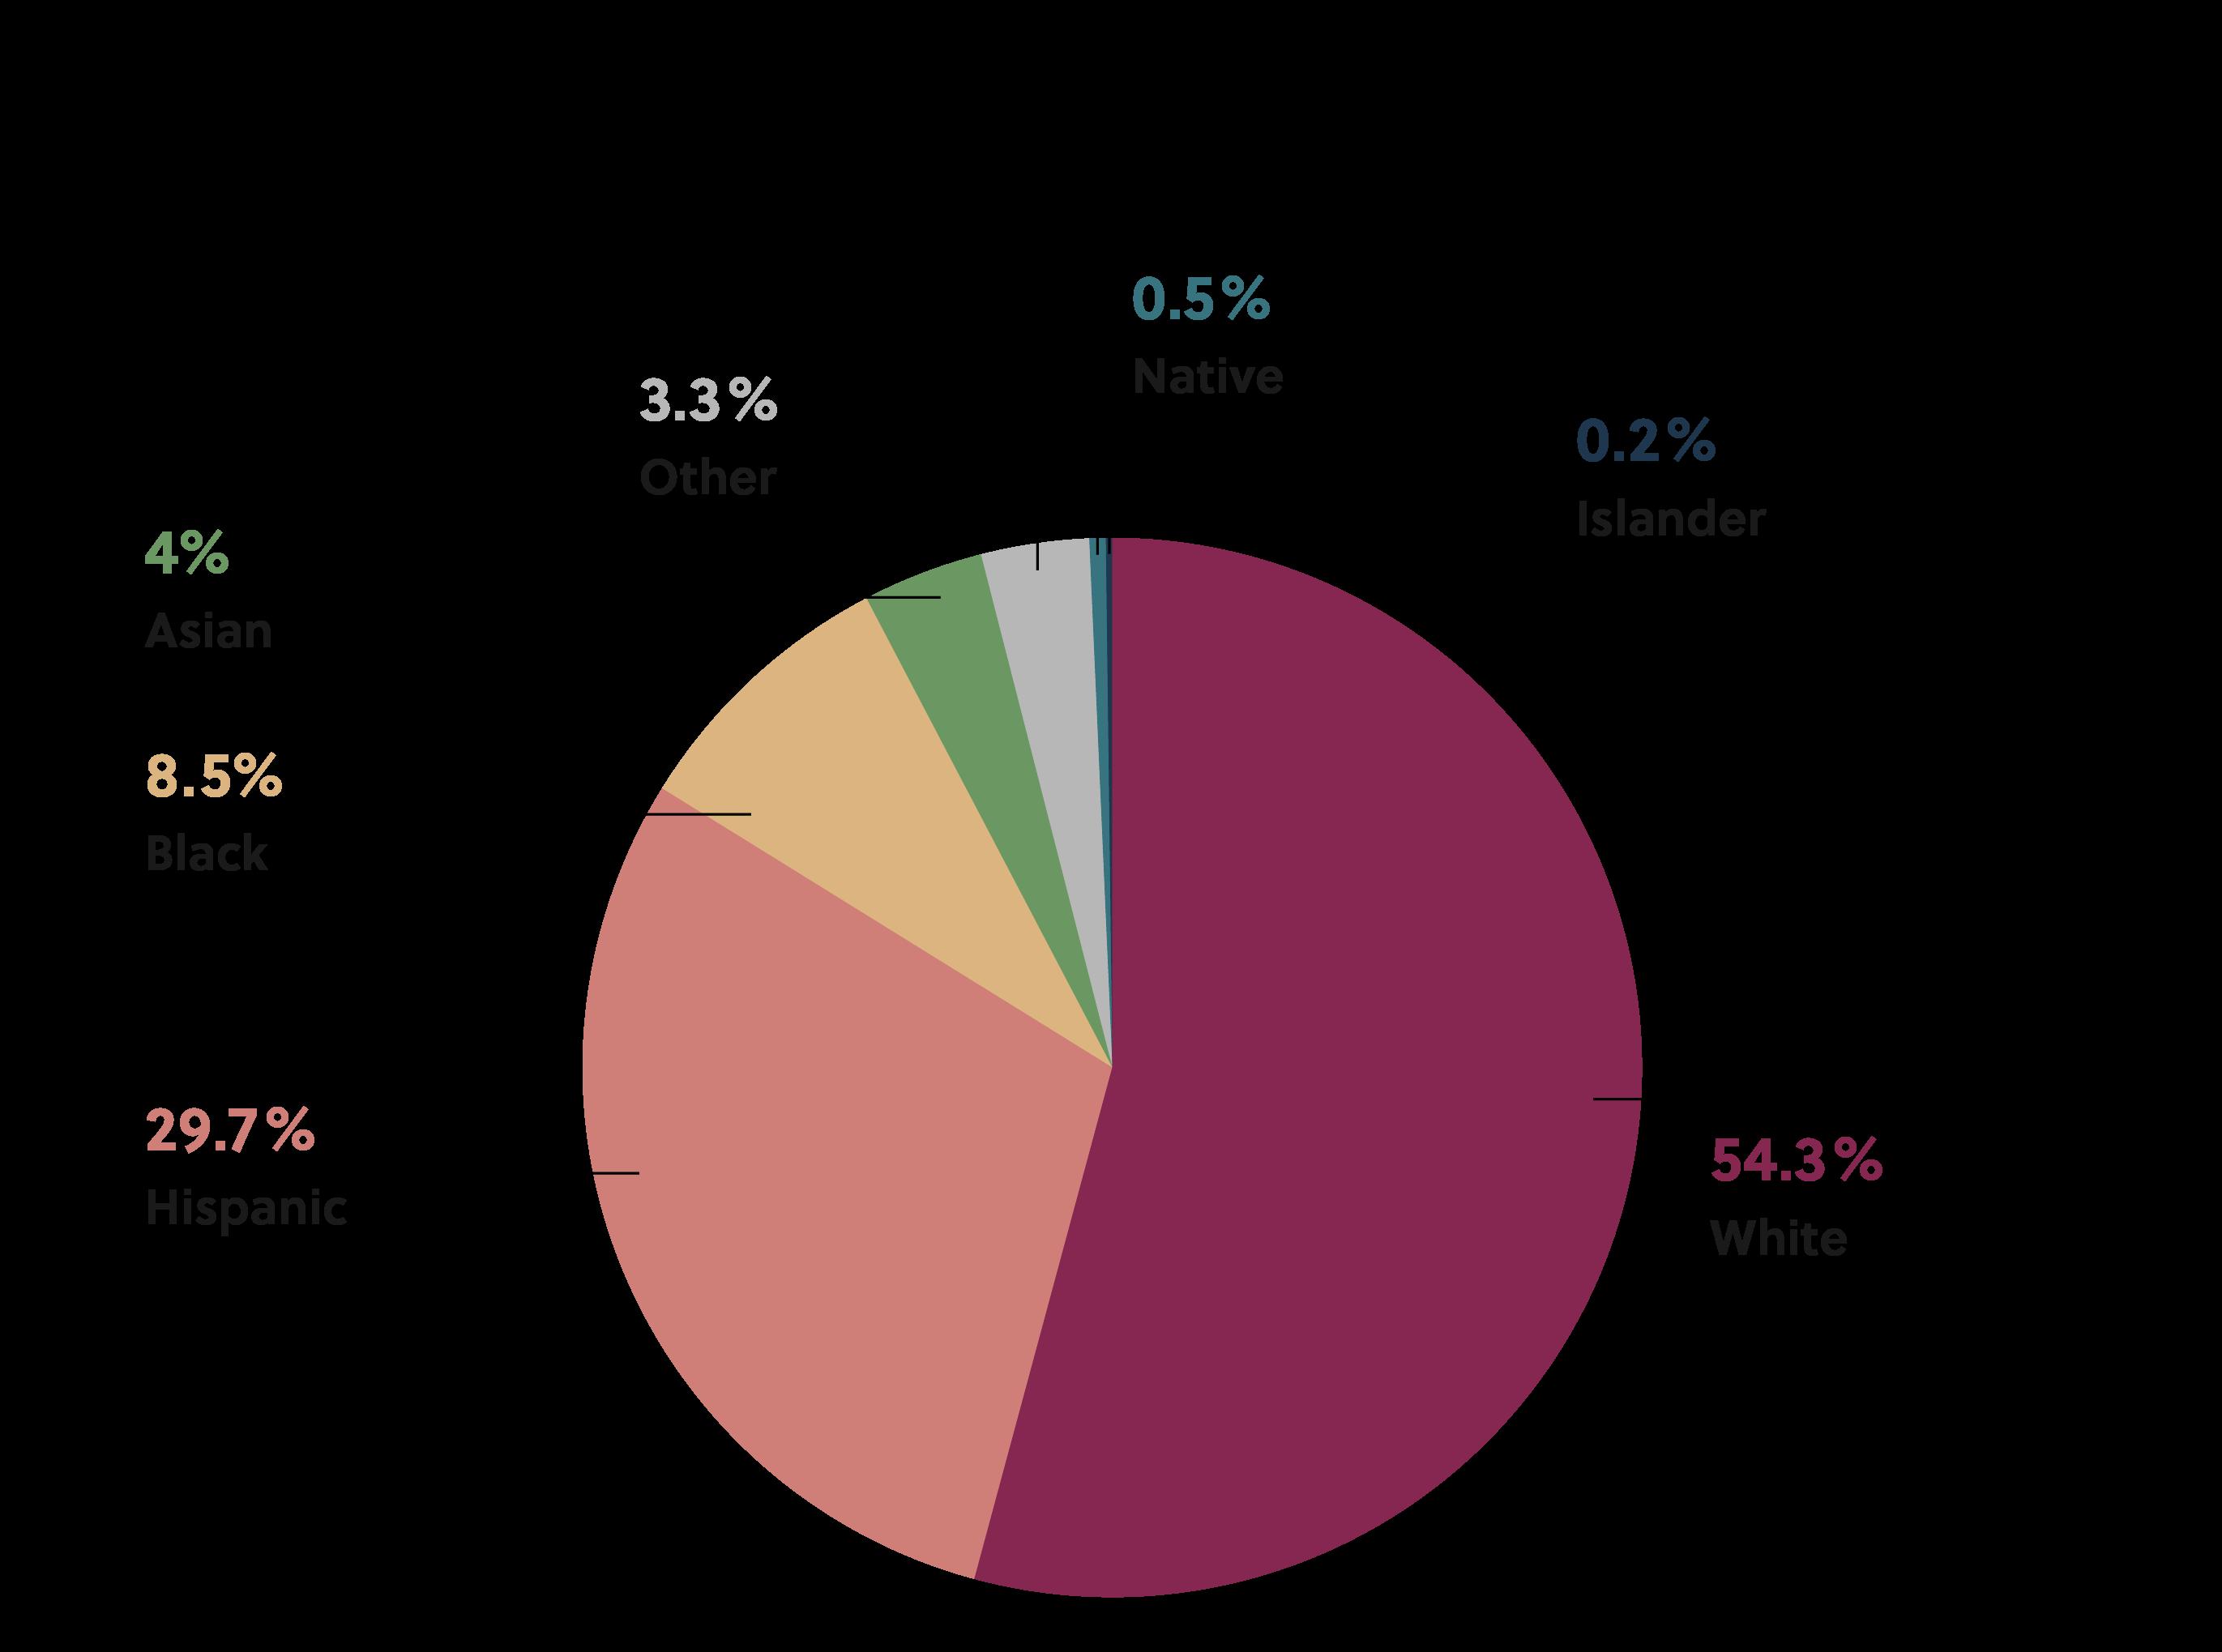 Pie chart of diversity in Denver, Colorado